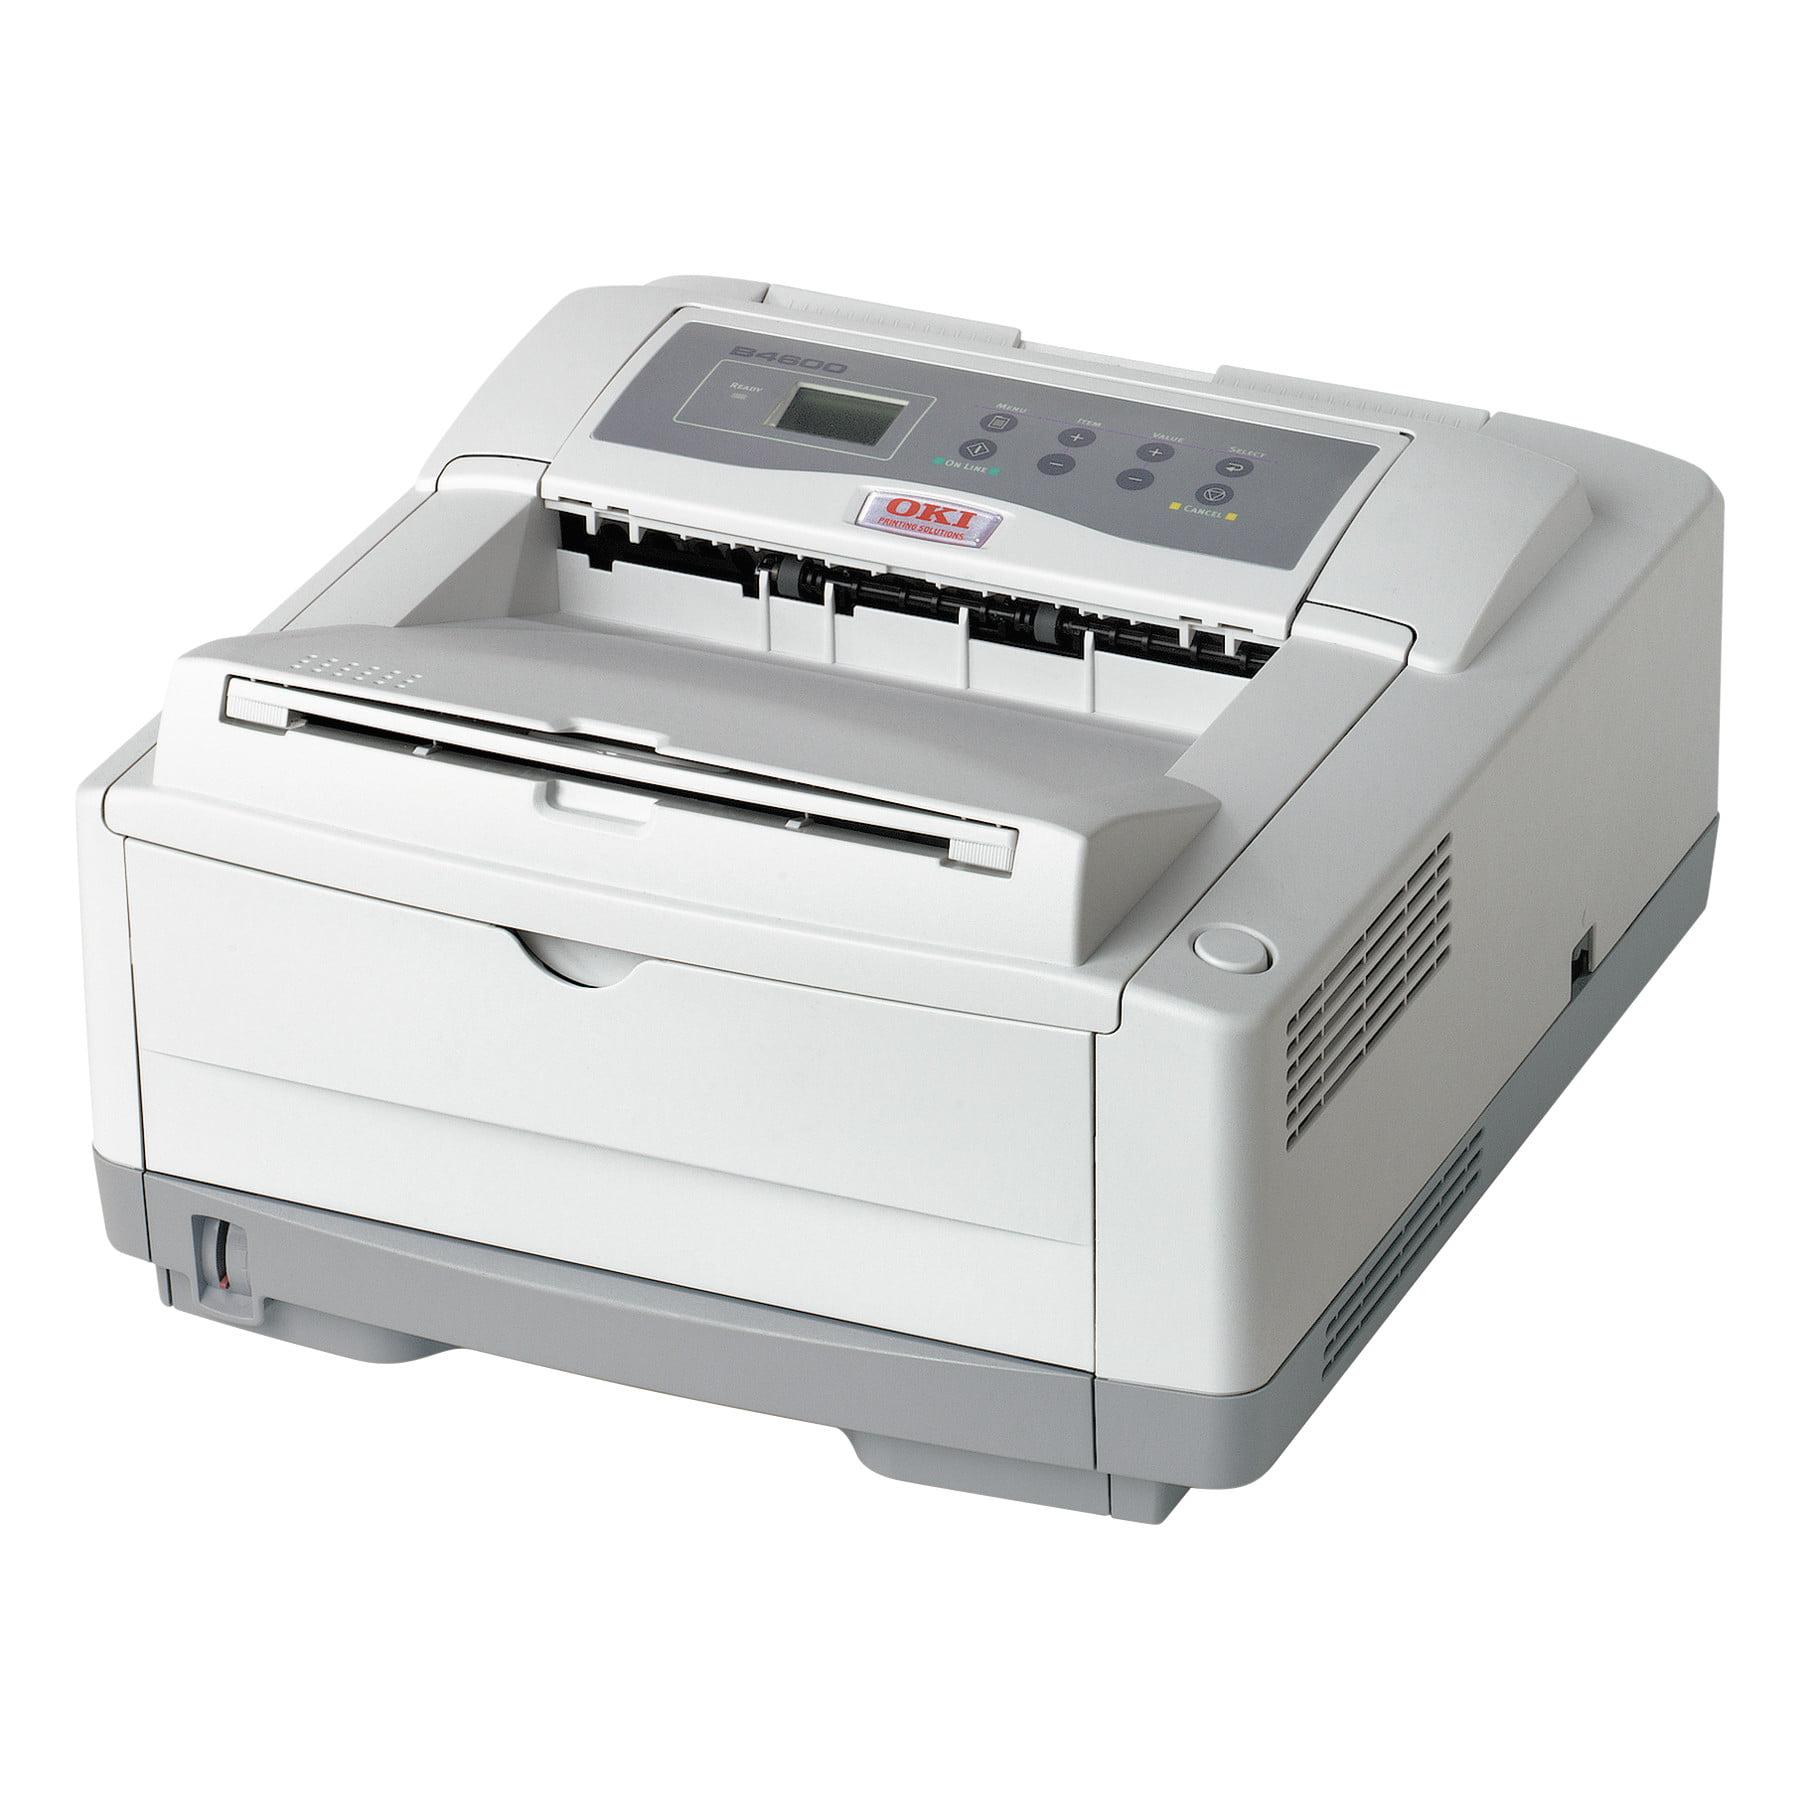 OKI B4600n - printer - monochrome - LED